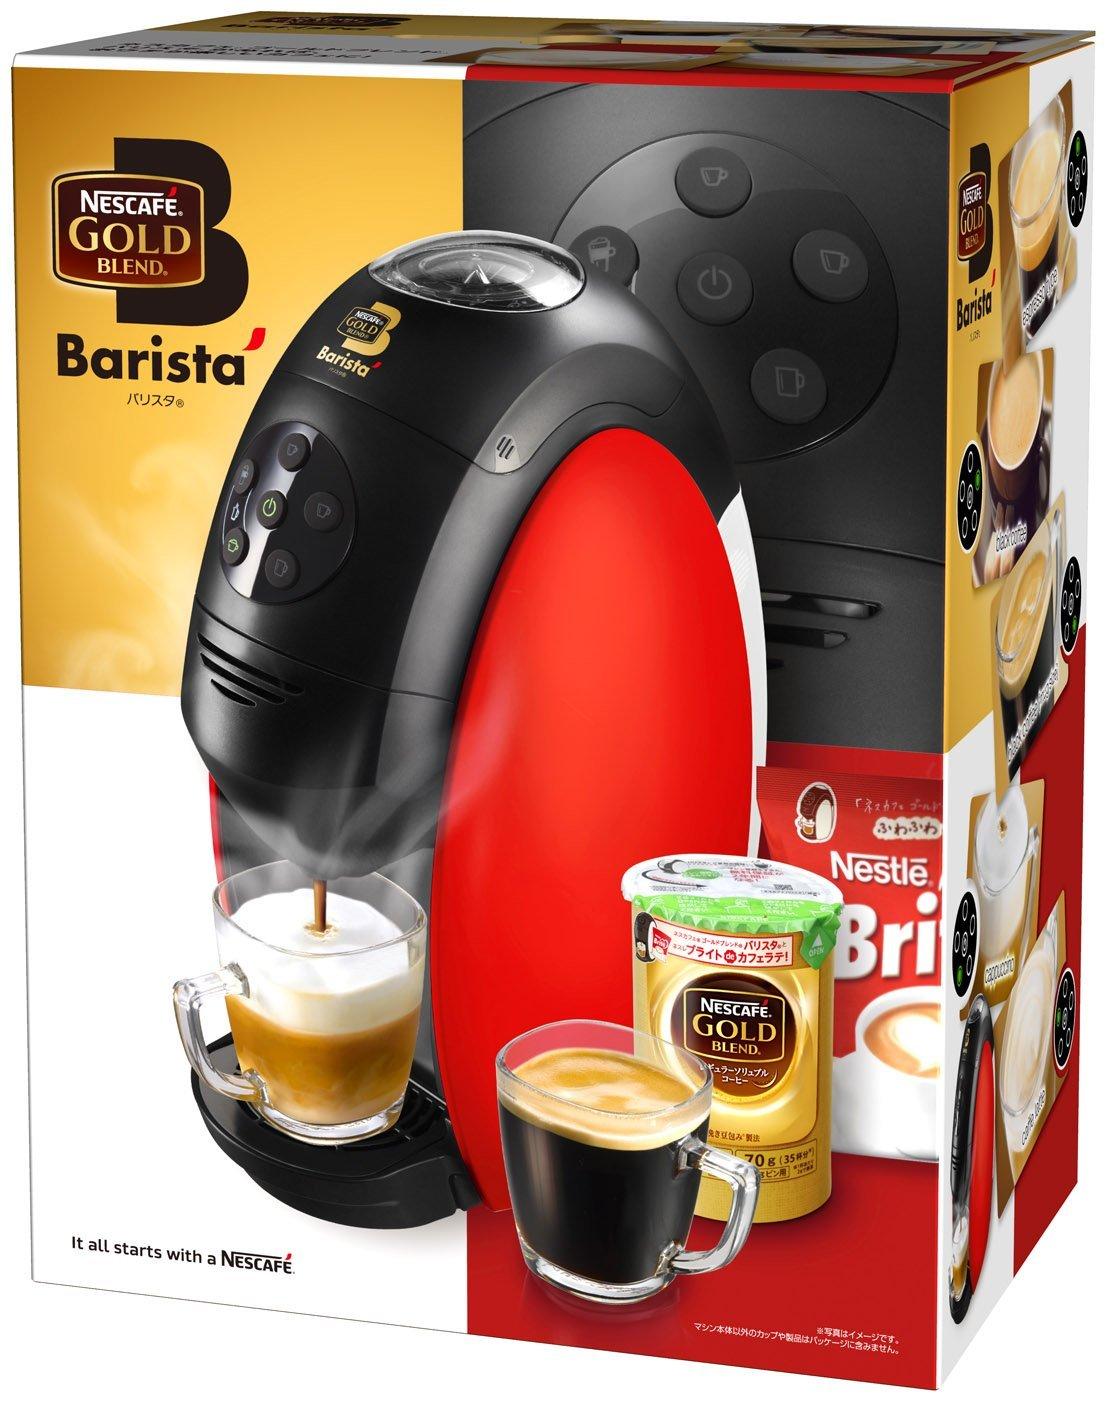 Nestlé 雀巢 Gold Blend Barista PM9631 混合型可变压式咖啡机